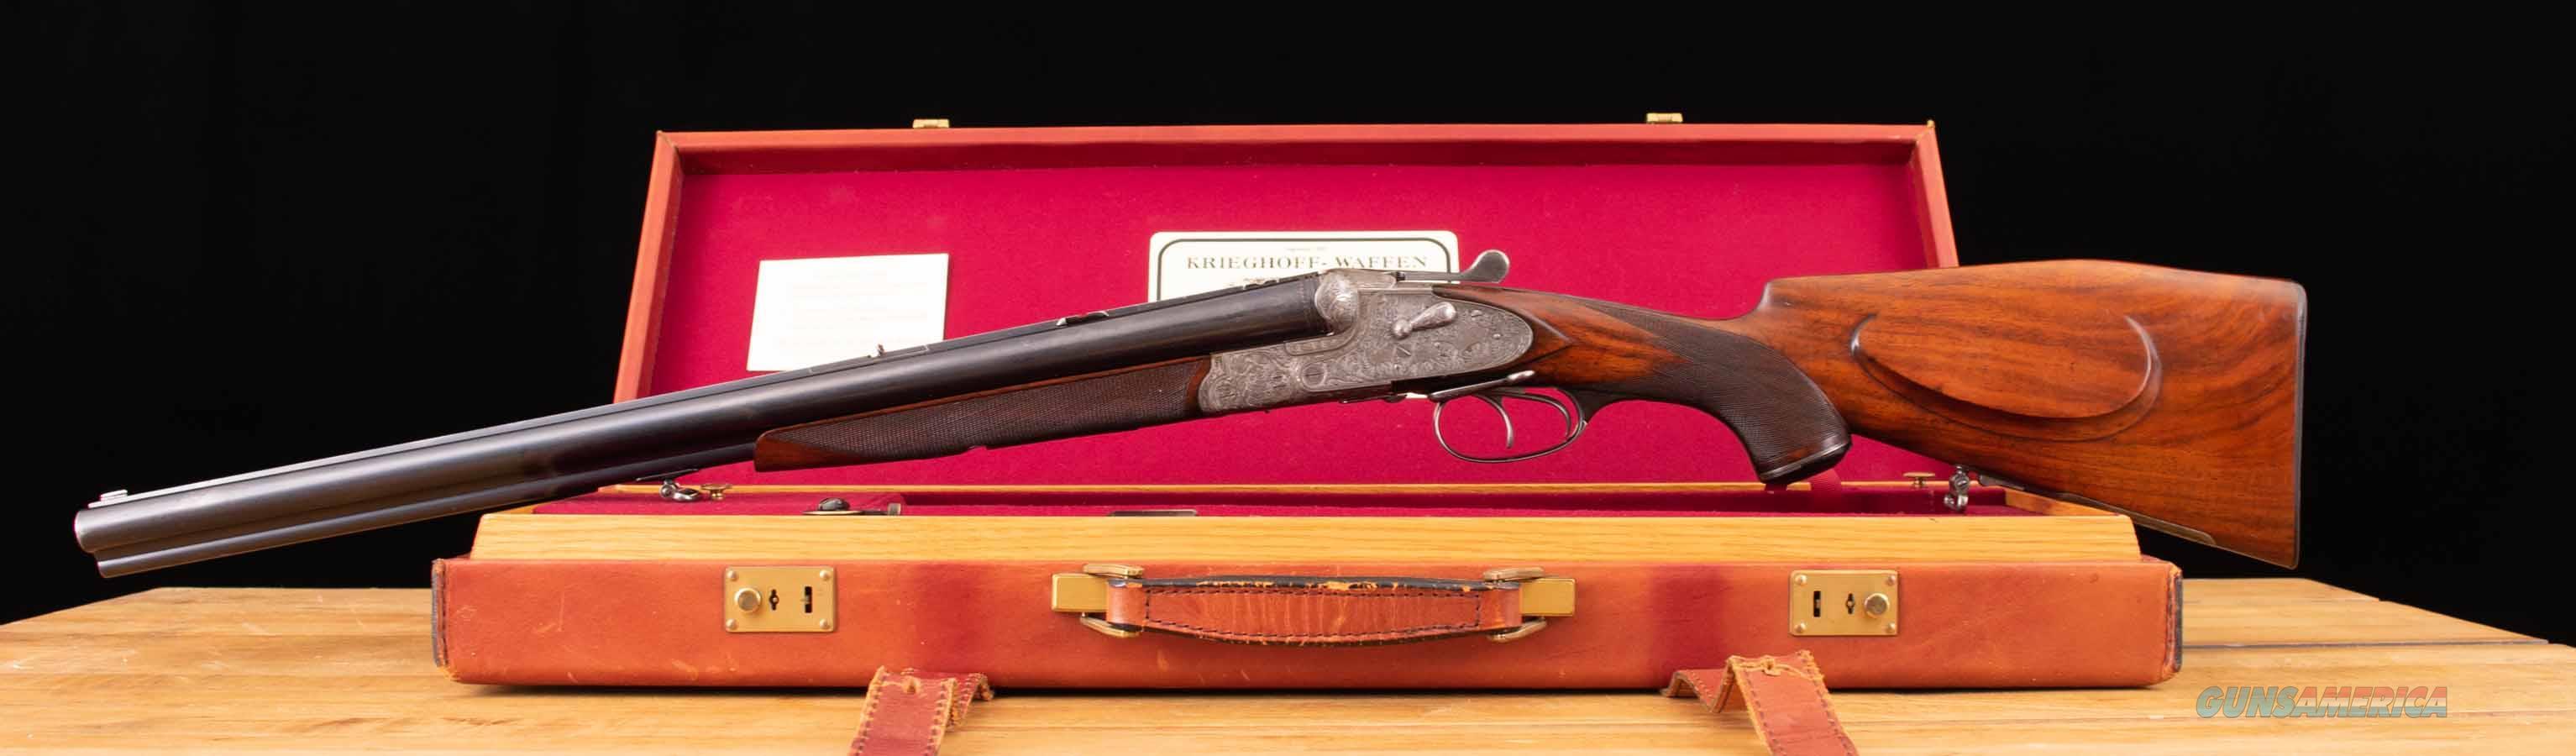 Krieghoff Neptun Primus Drilling – 1930, SIDELOCK, DETACHABLE TRIGGER, vintage firearms inc  Guns > Shotguns > Krieghoff Shotguns